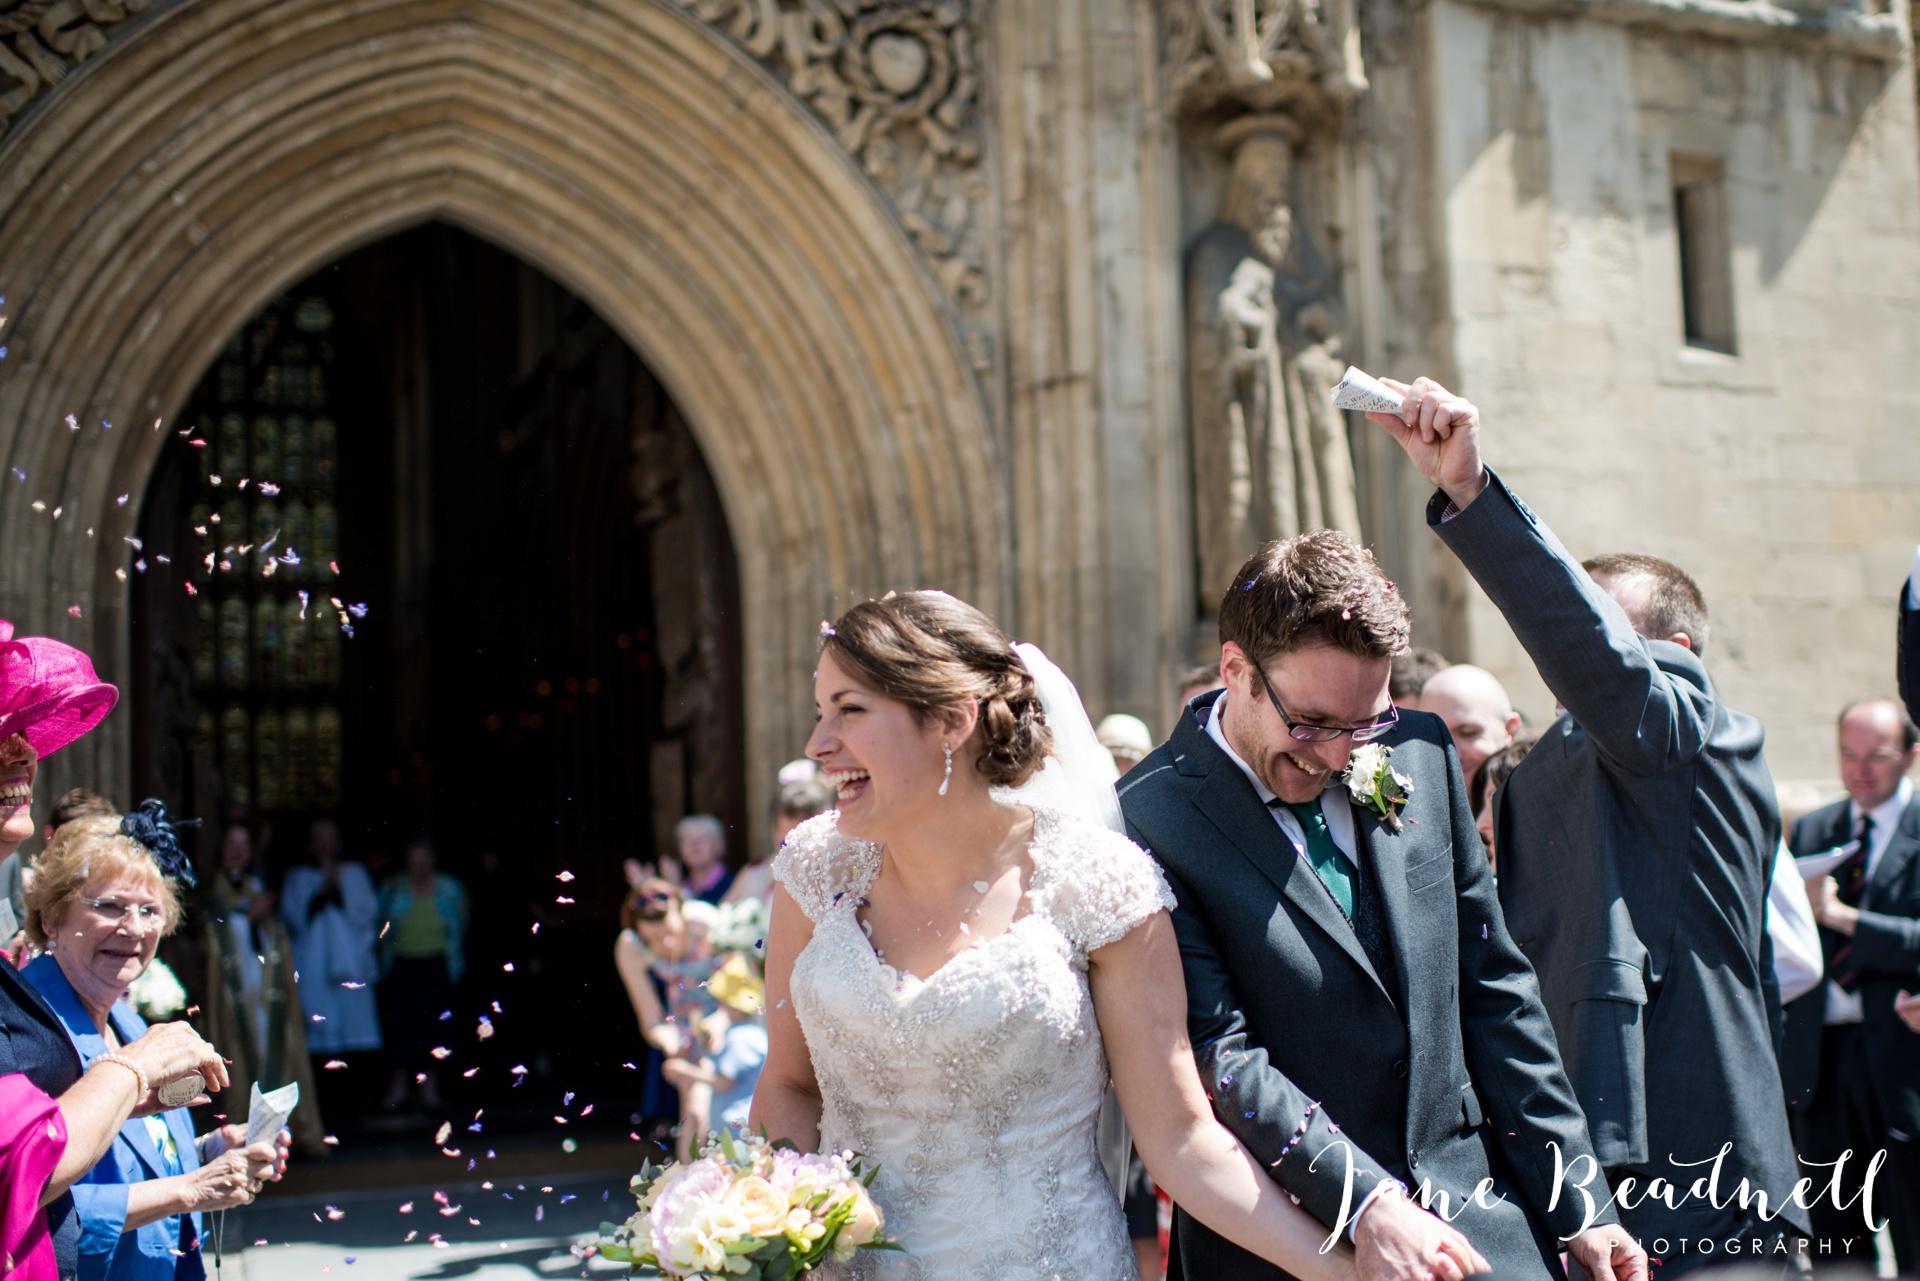 Bath Abbey wedding photography by fine art wedding photographer Leeds Jane Beadnell_18